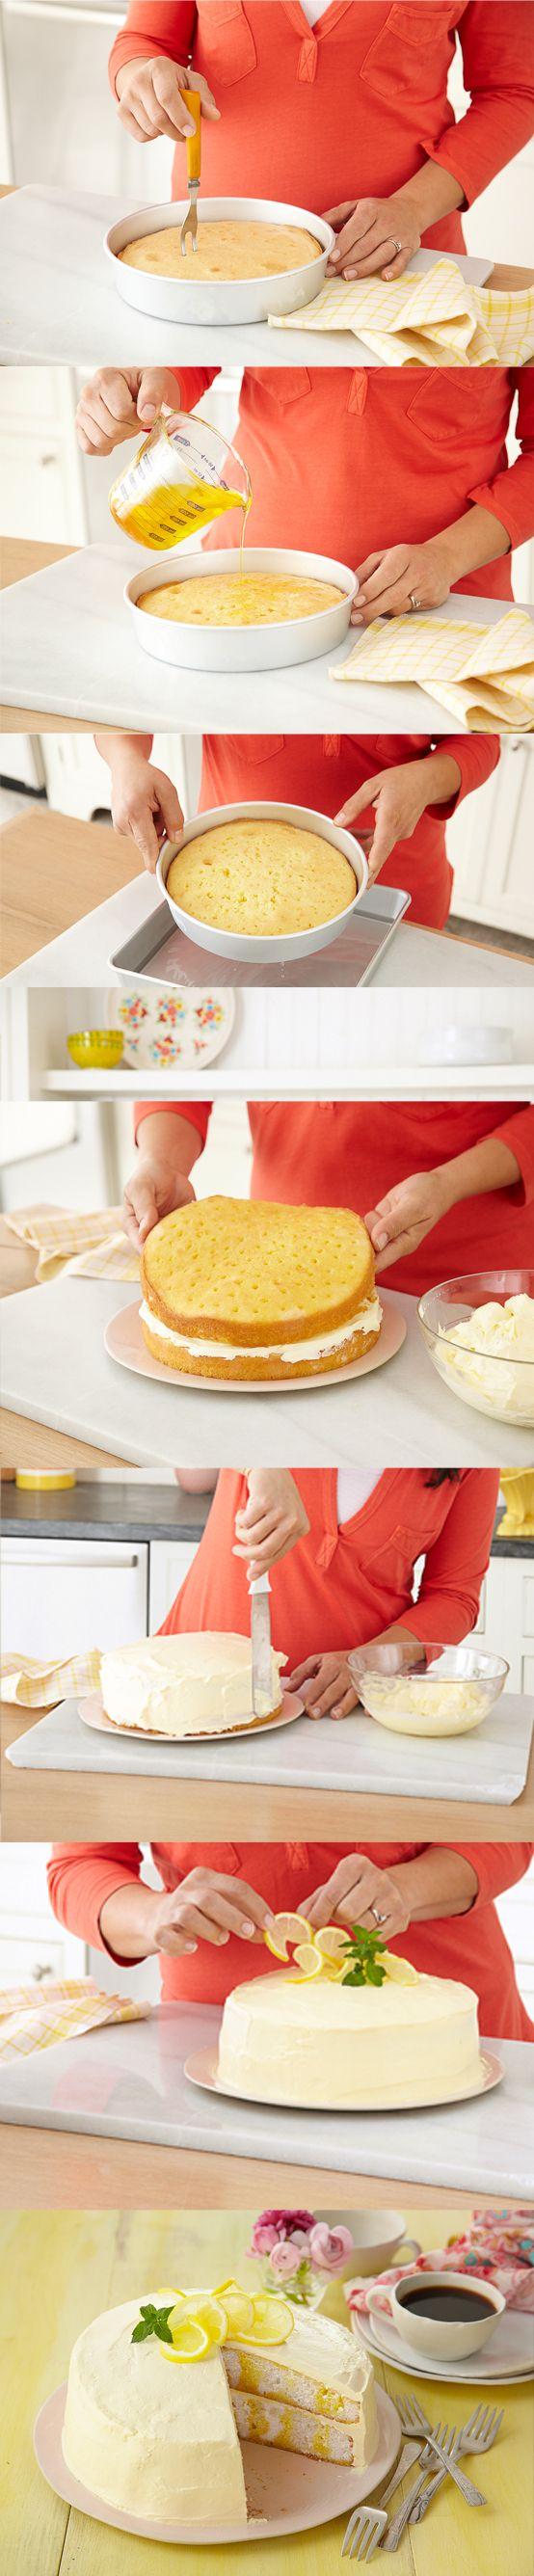 Luscious Lemon Poke Cake recipe - showstopper dessert!